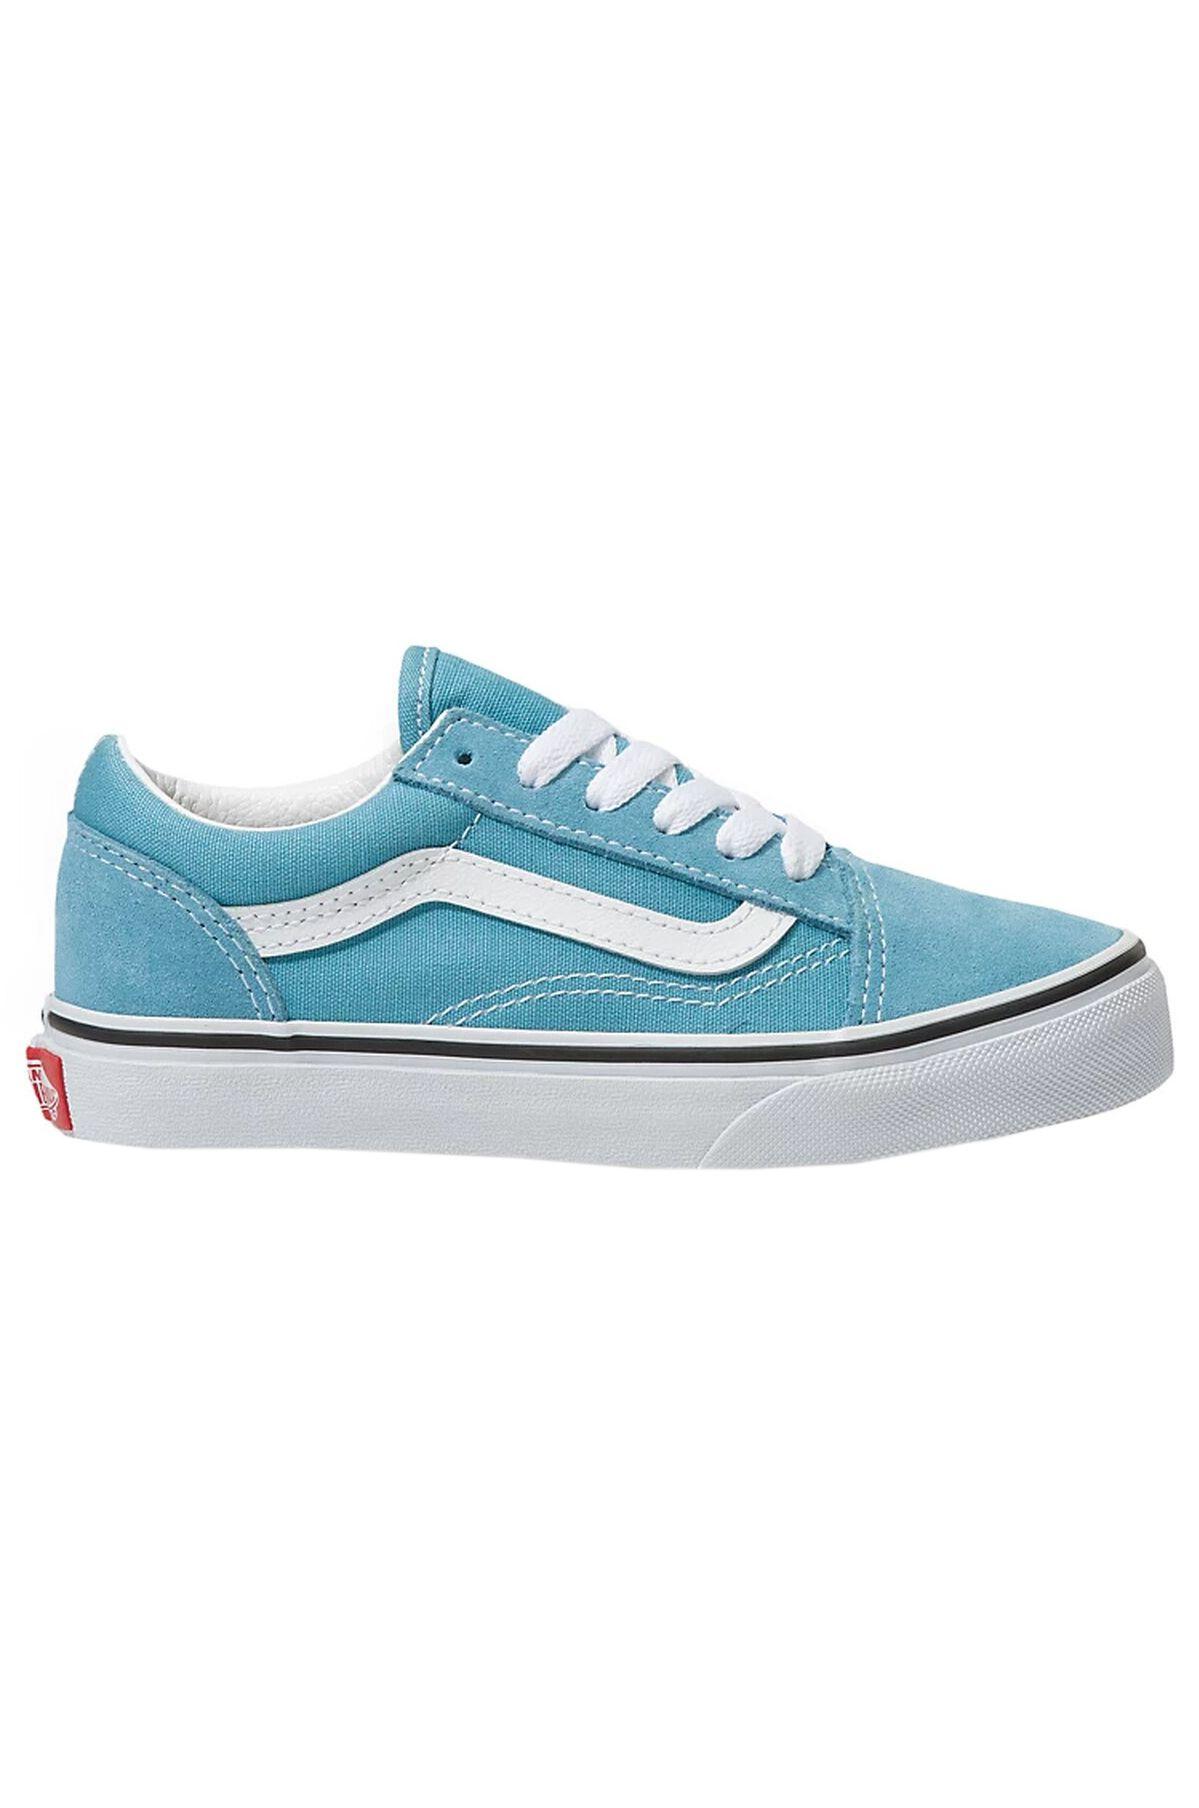 Vans Shoes JN OLD SKOOL Delphinium Blue/True White